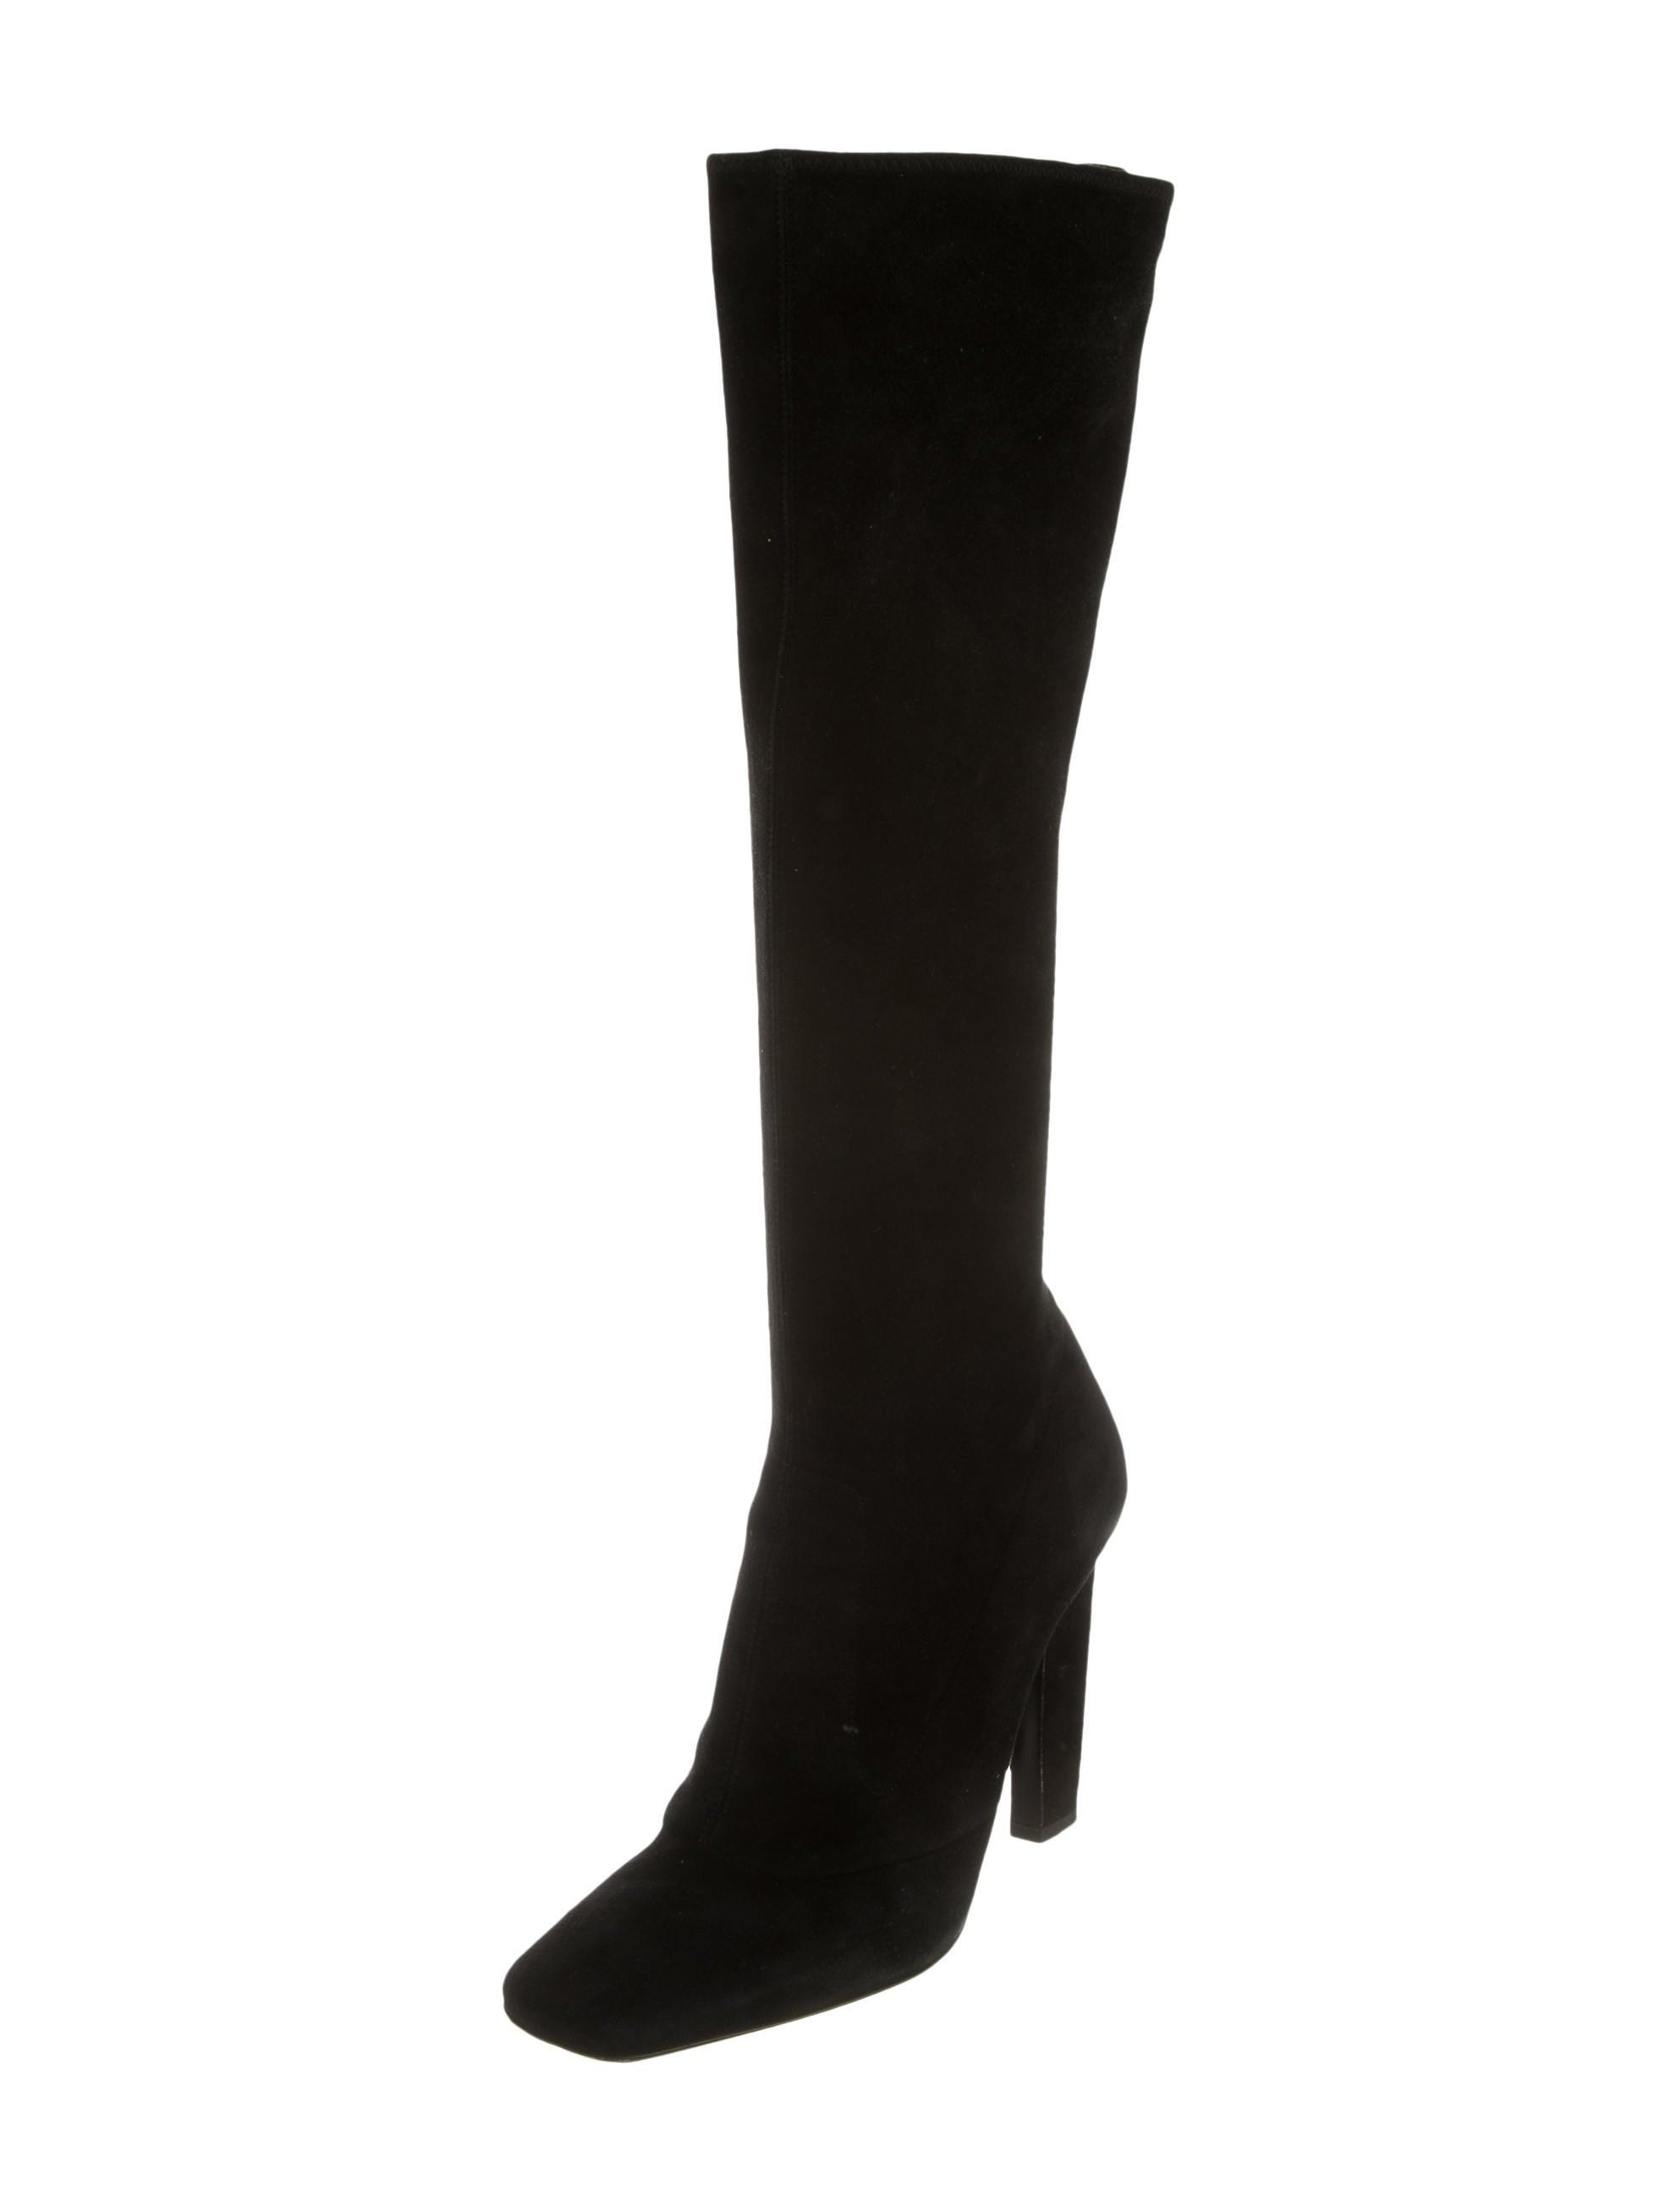 prada suede knee high boots shoes pra117008 the realreal